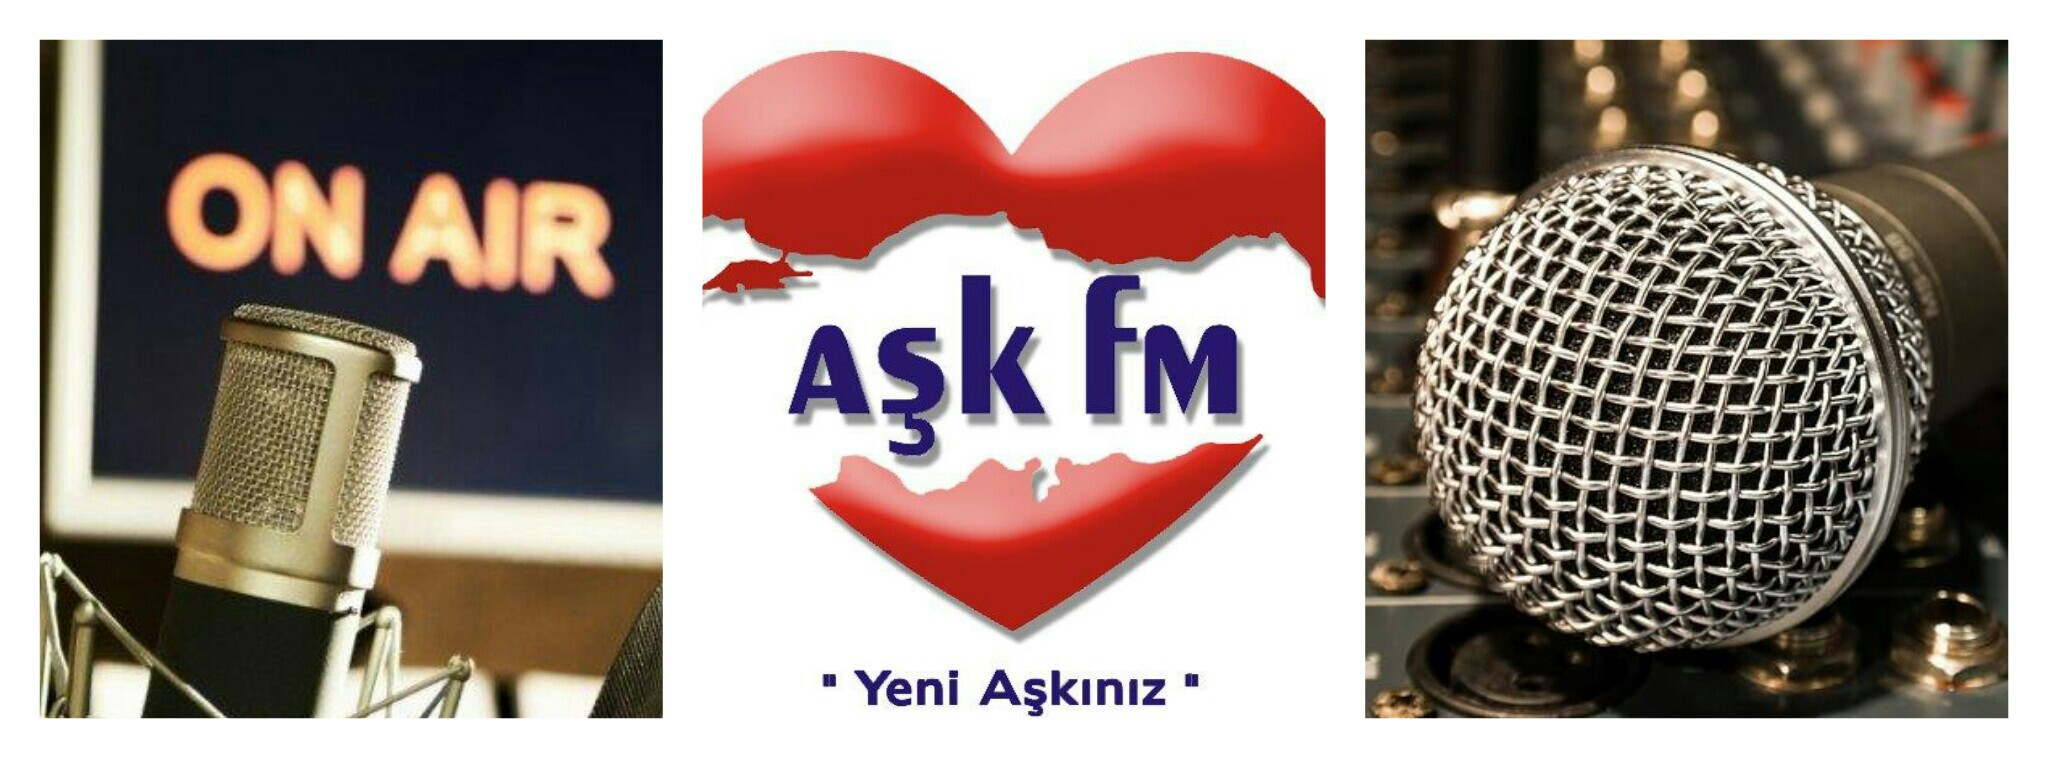 ask_fm